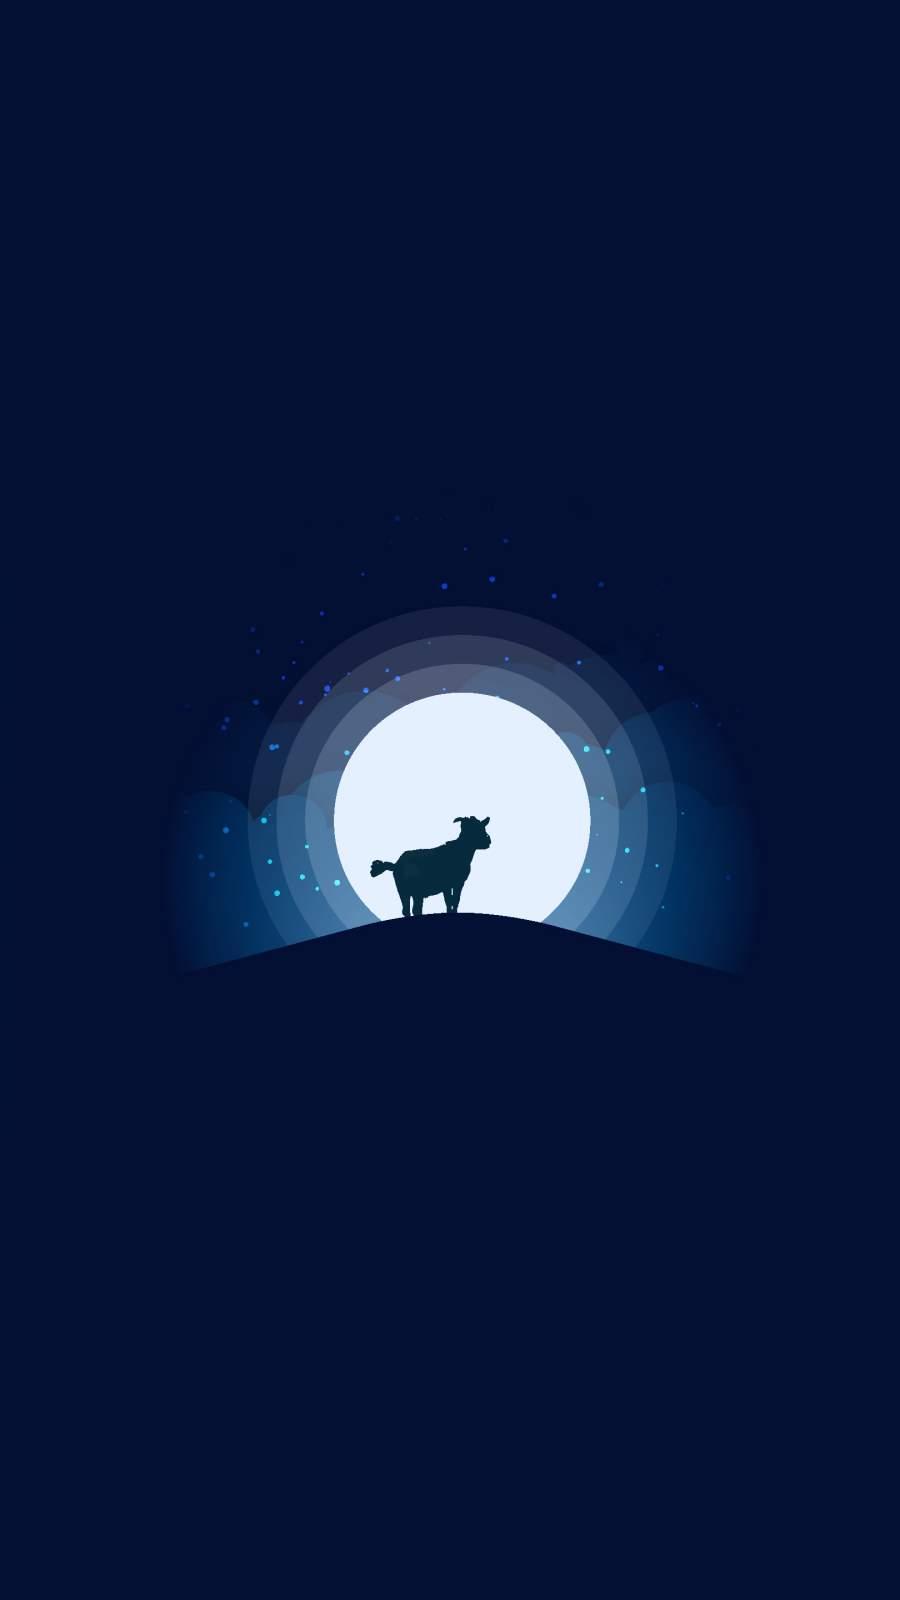 Goat iPhone Wallpaper